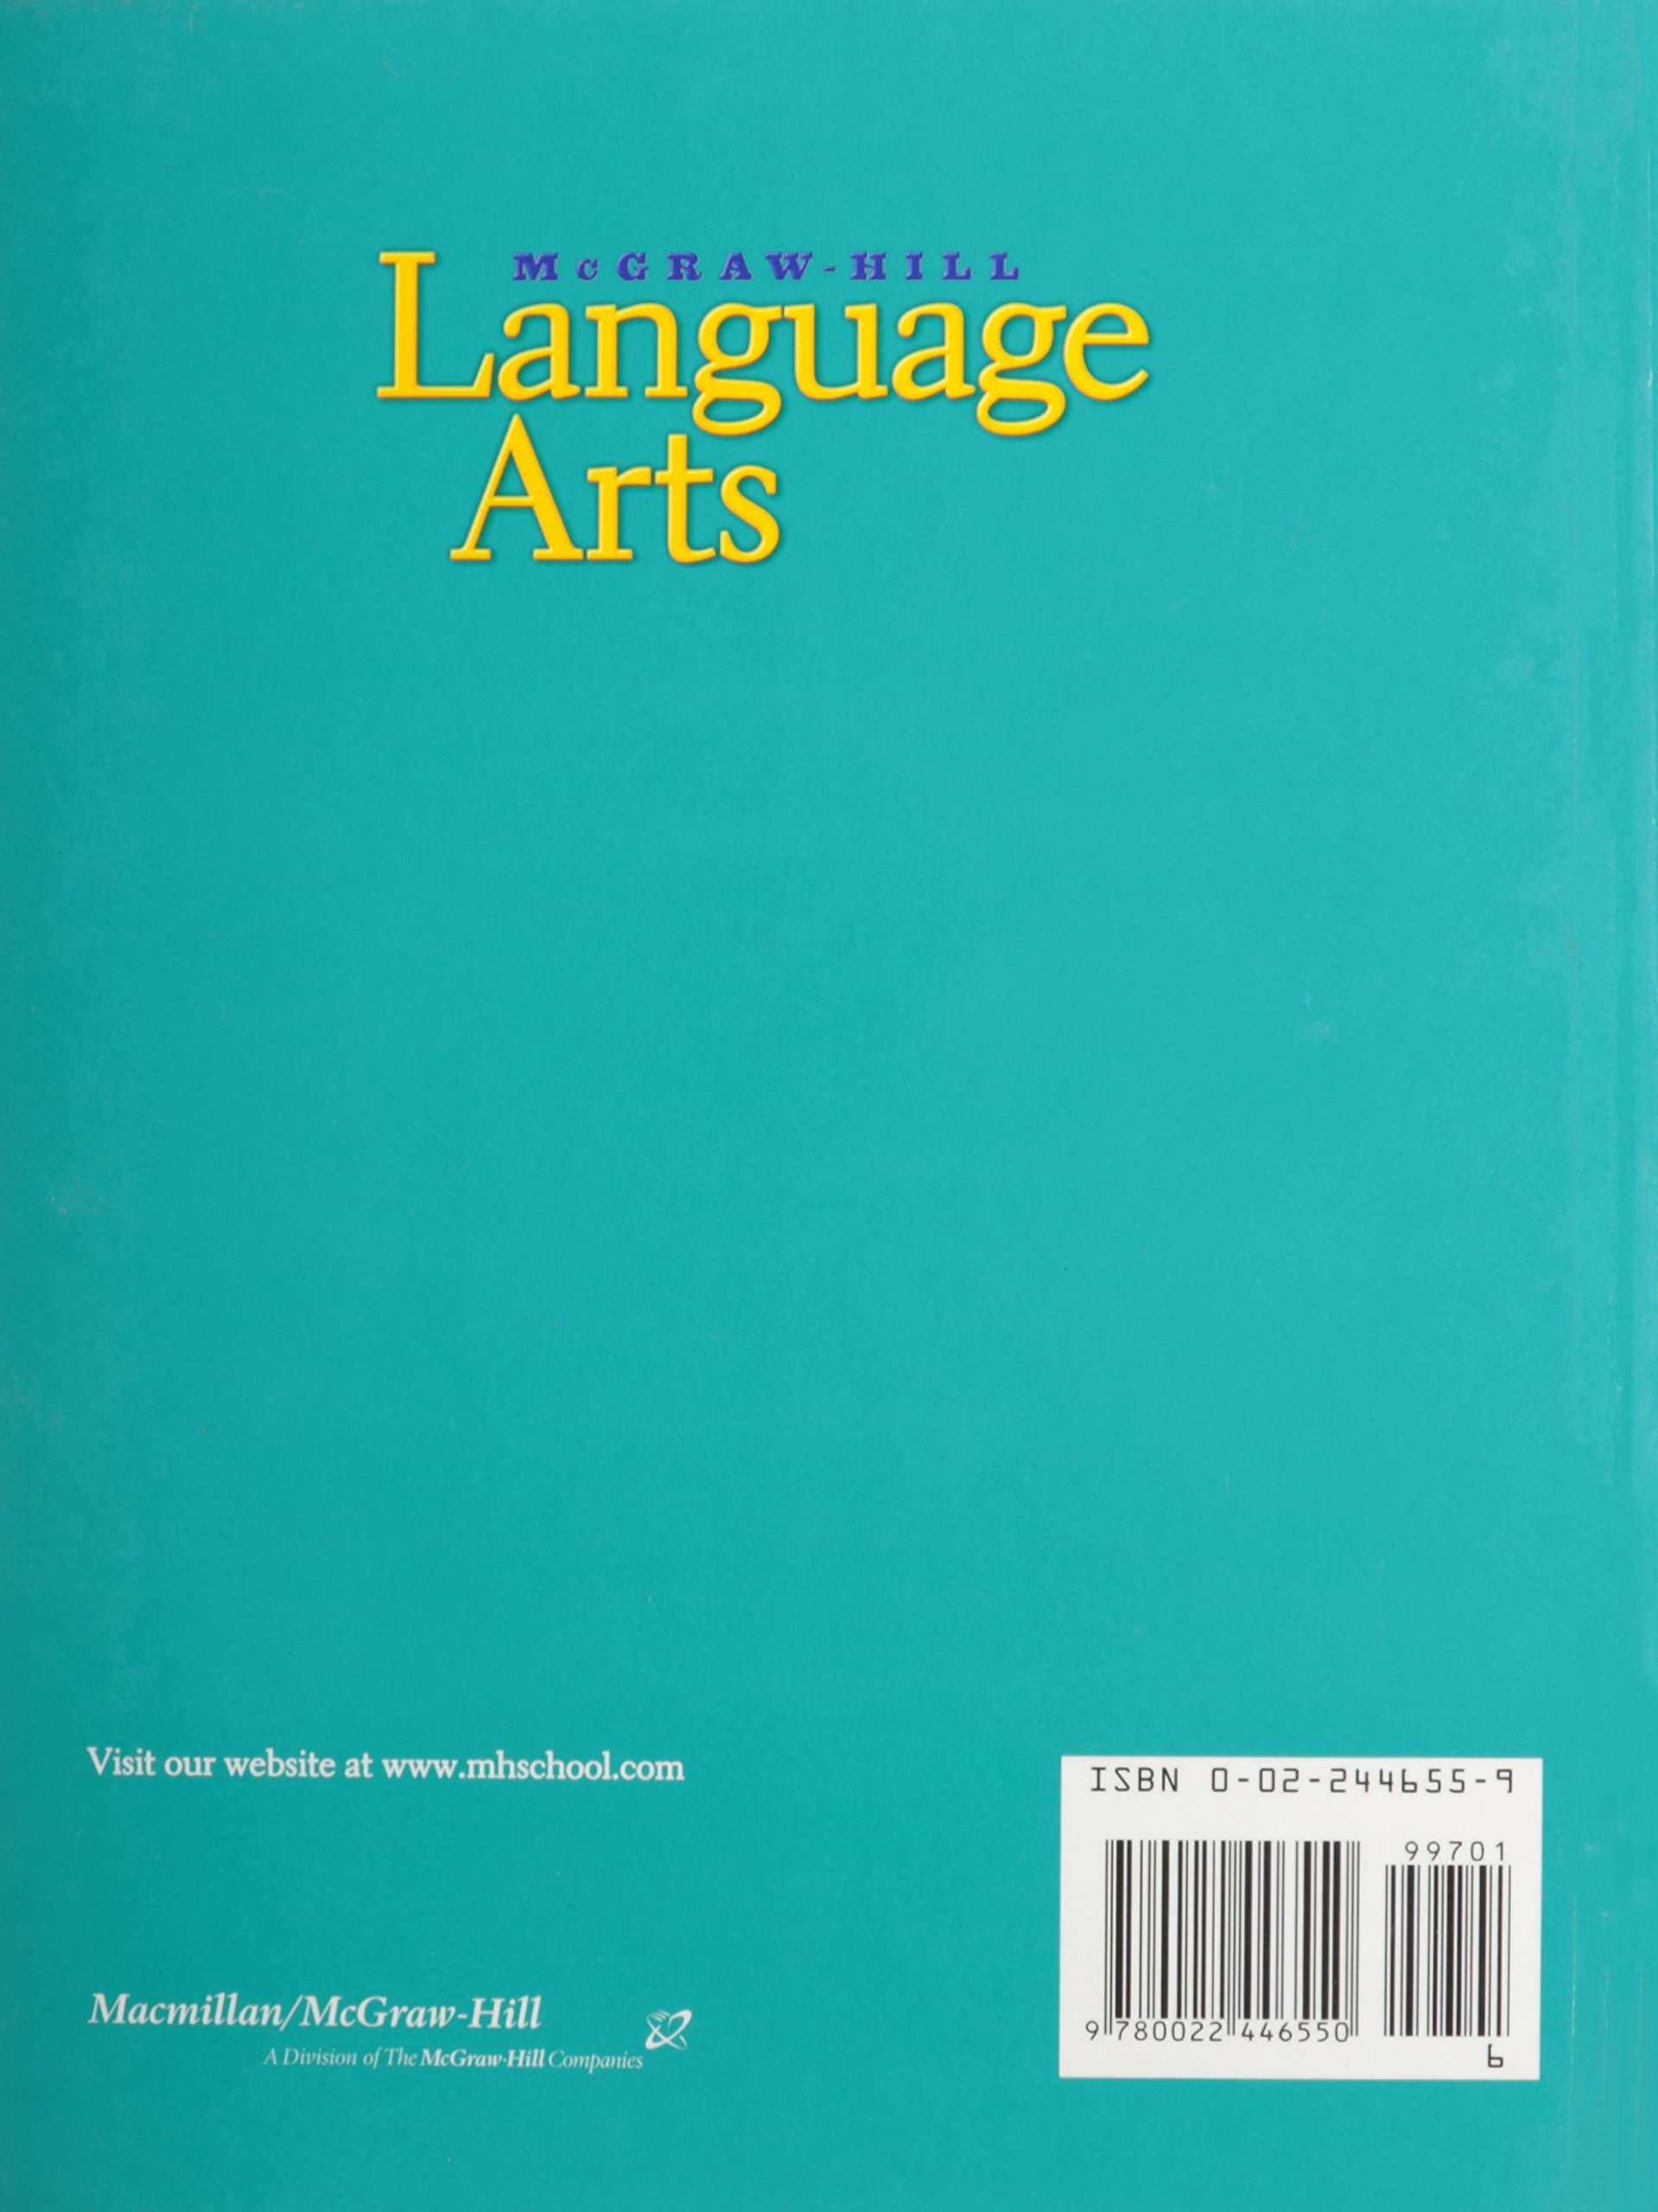 McGraw Hill Language Arts Grade 6 by Macmillan/McGraw-Hill School Div (Image #2)